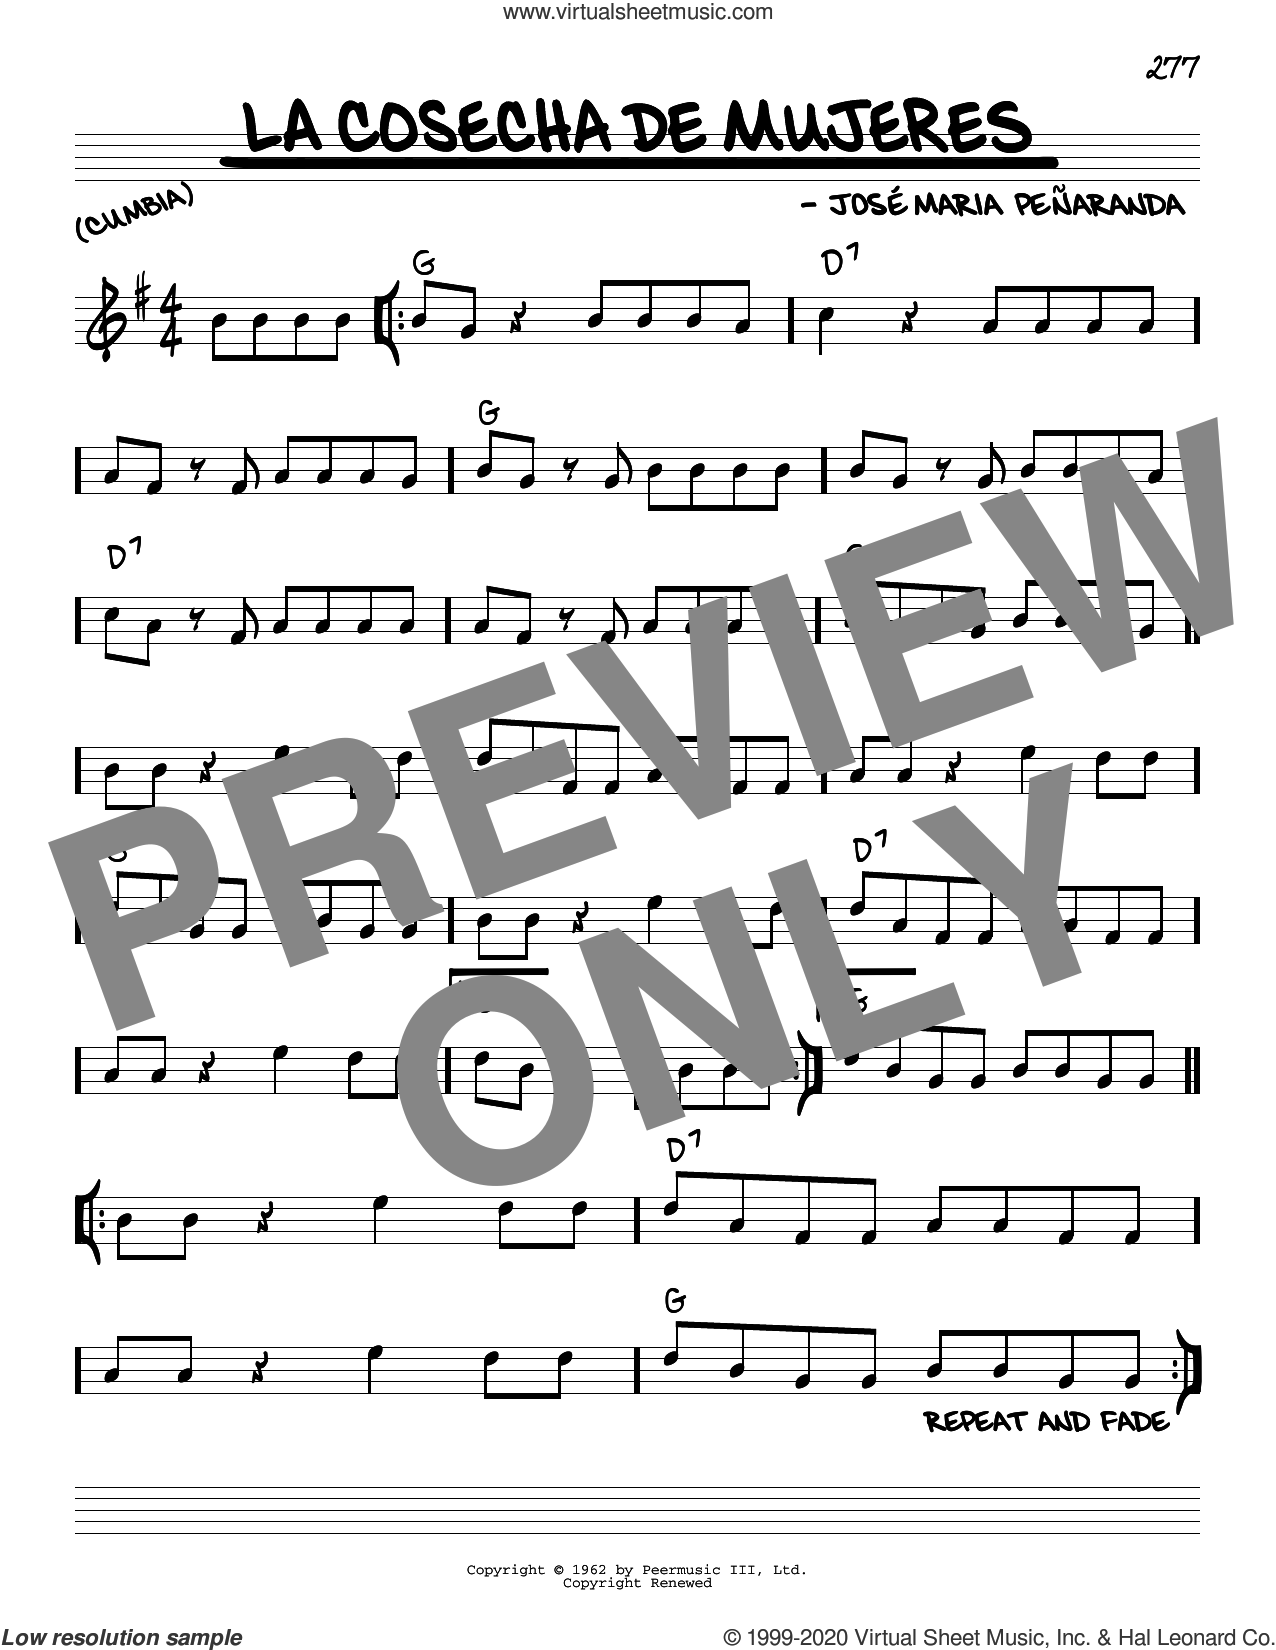 La Cosecha De Mujeres sheet music for voice and other instruments (real book) by José Maria Peñaranda, intermediate skill level